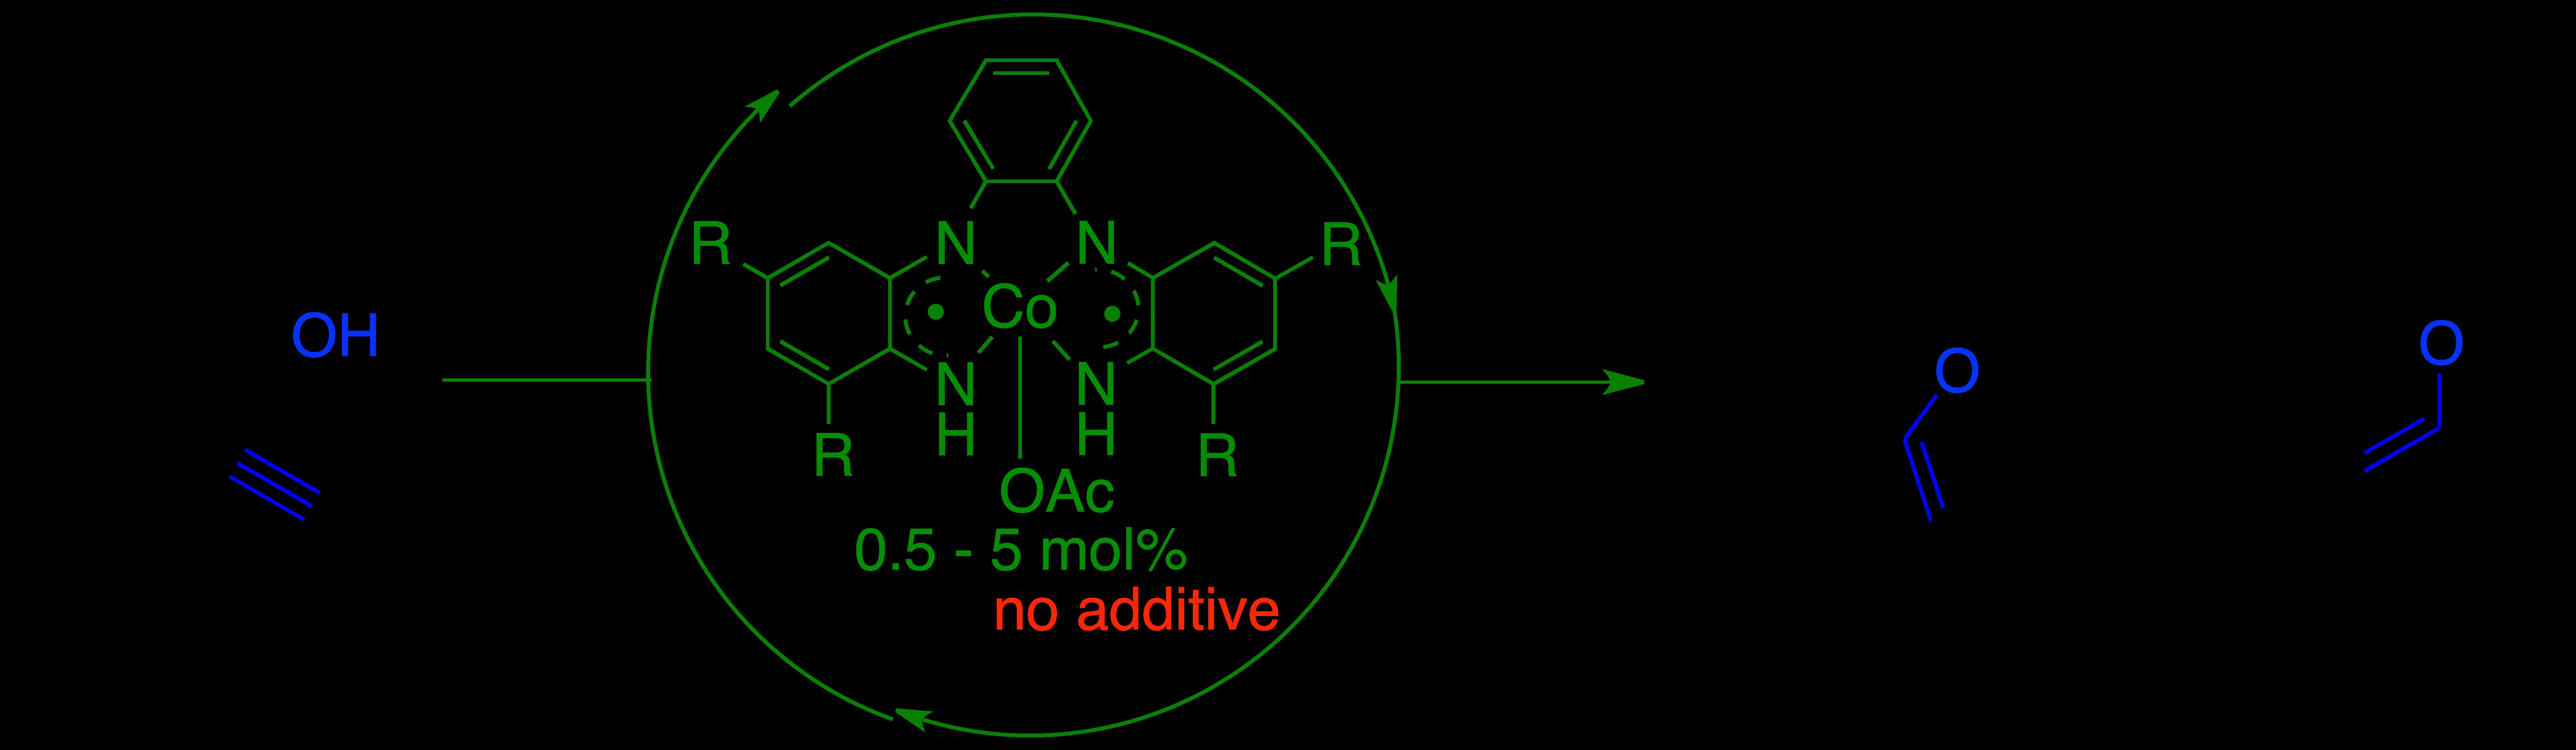 oxycarbonylation.png